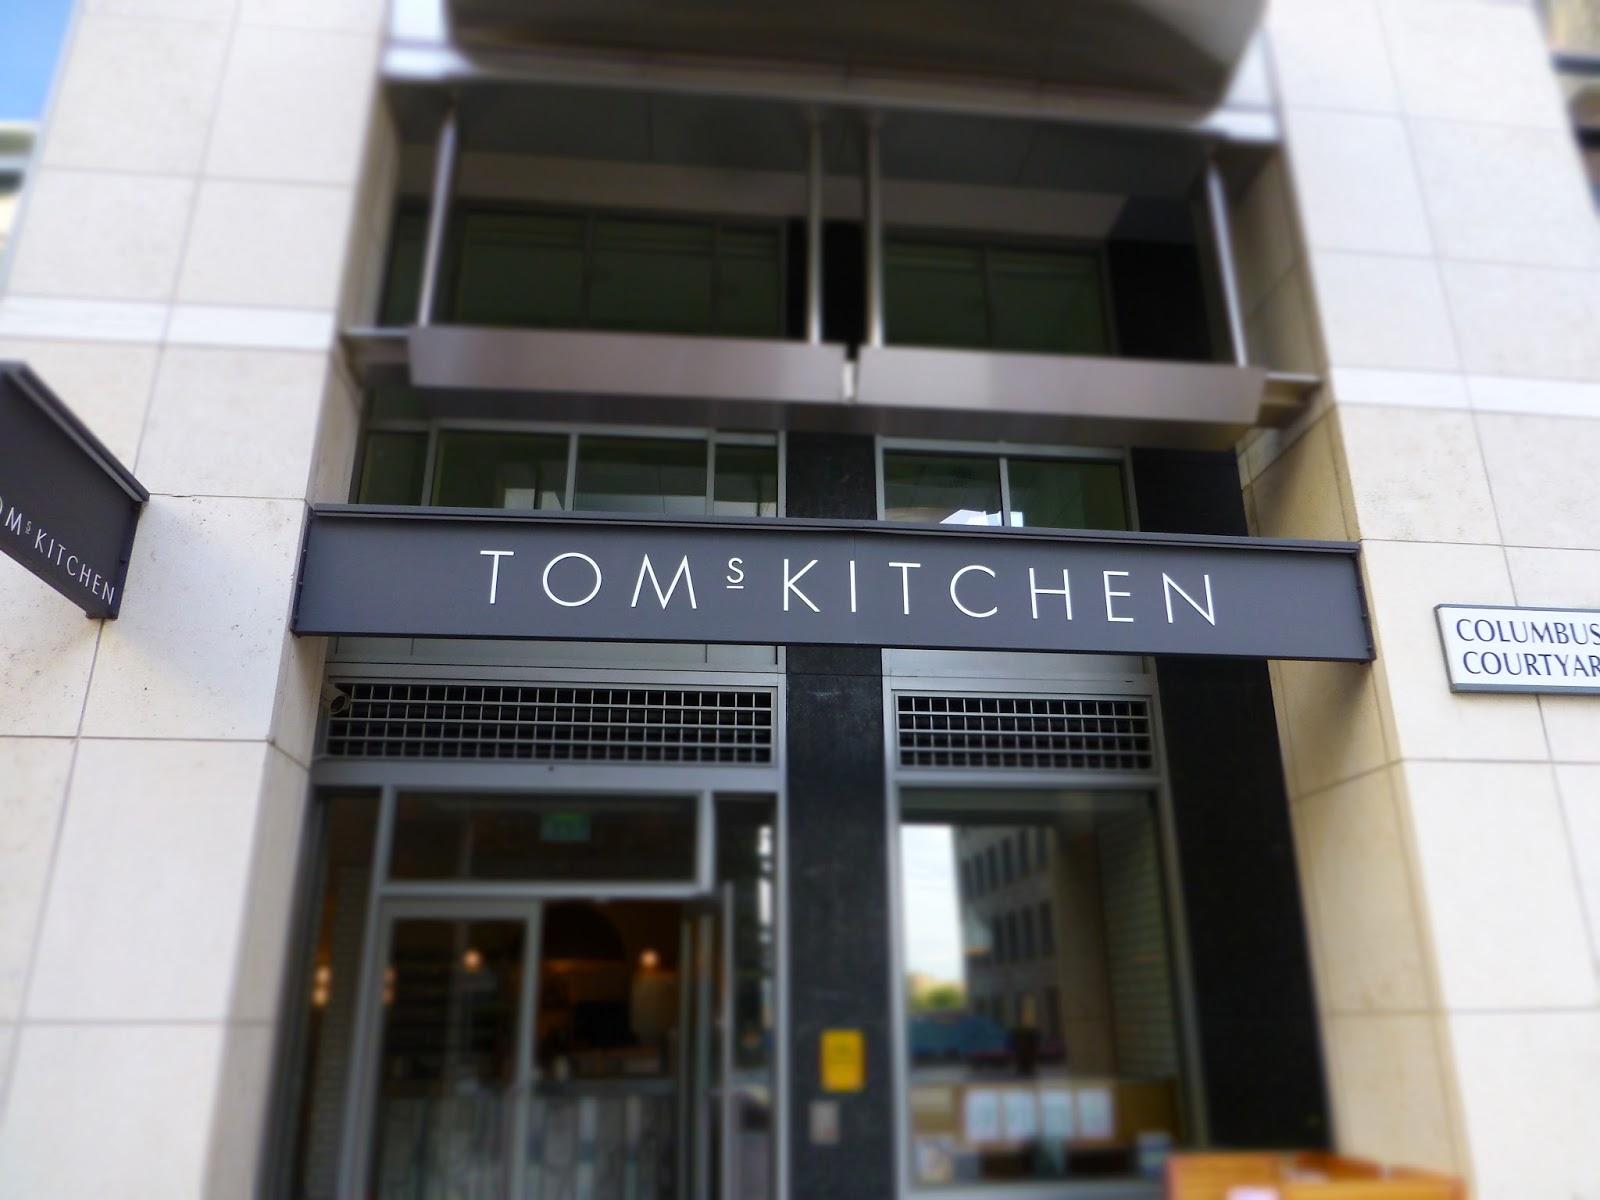 Tom S Kitchen Canary Wharf London E